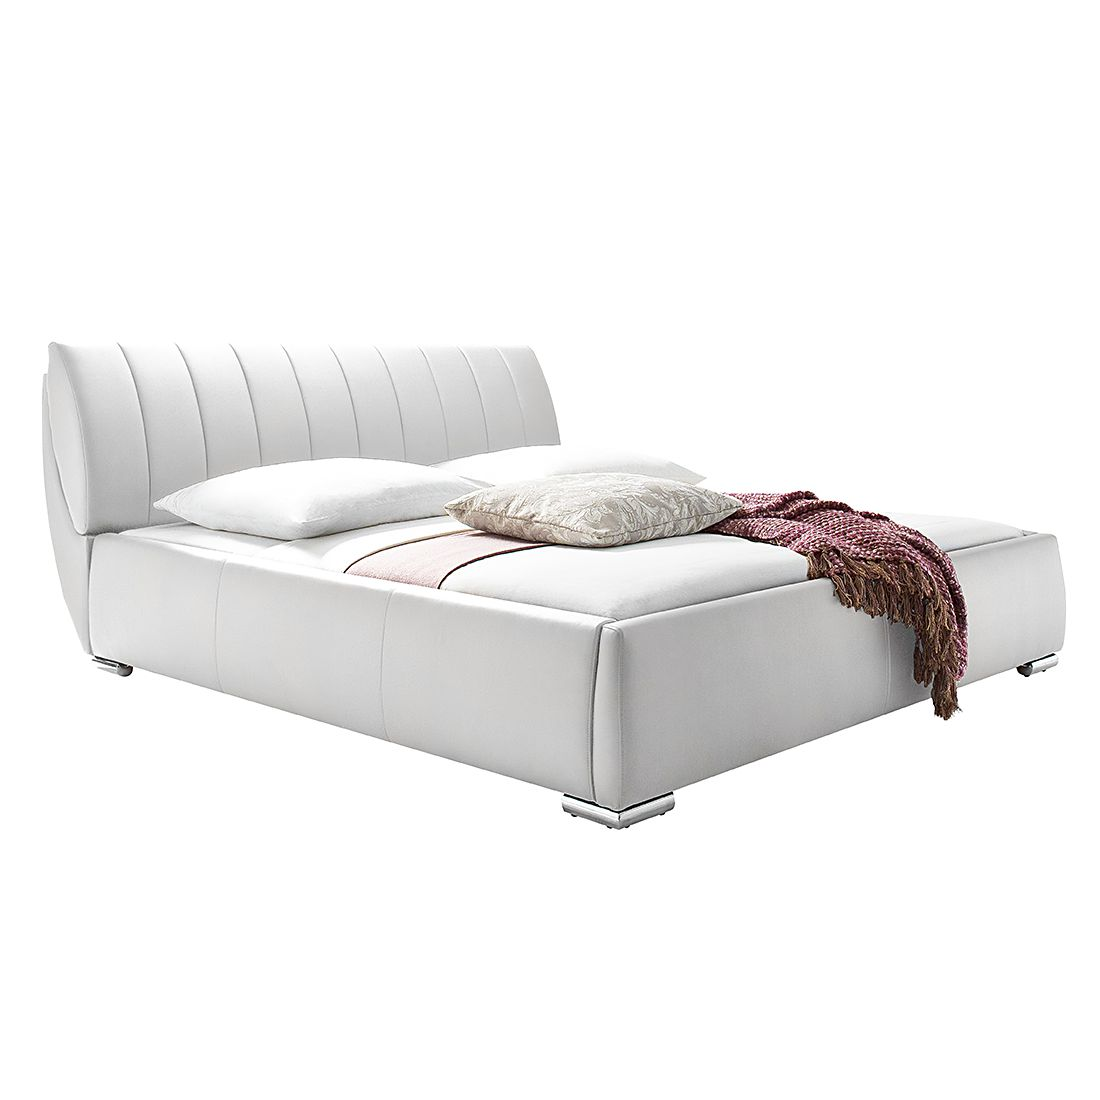 Gestoffeerd bed Luna - kunstleer - 180 x 200cm - Met matras - Wit, meise möbel